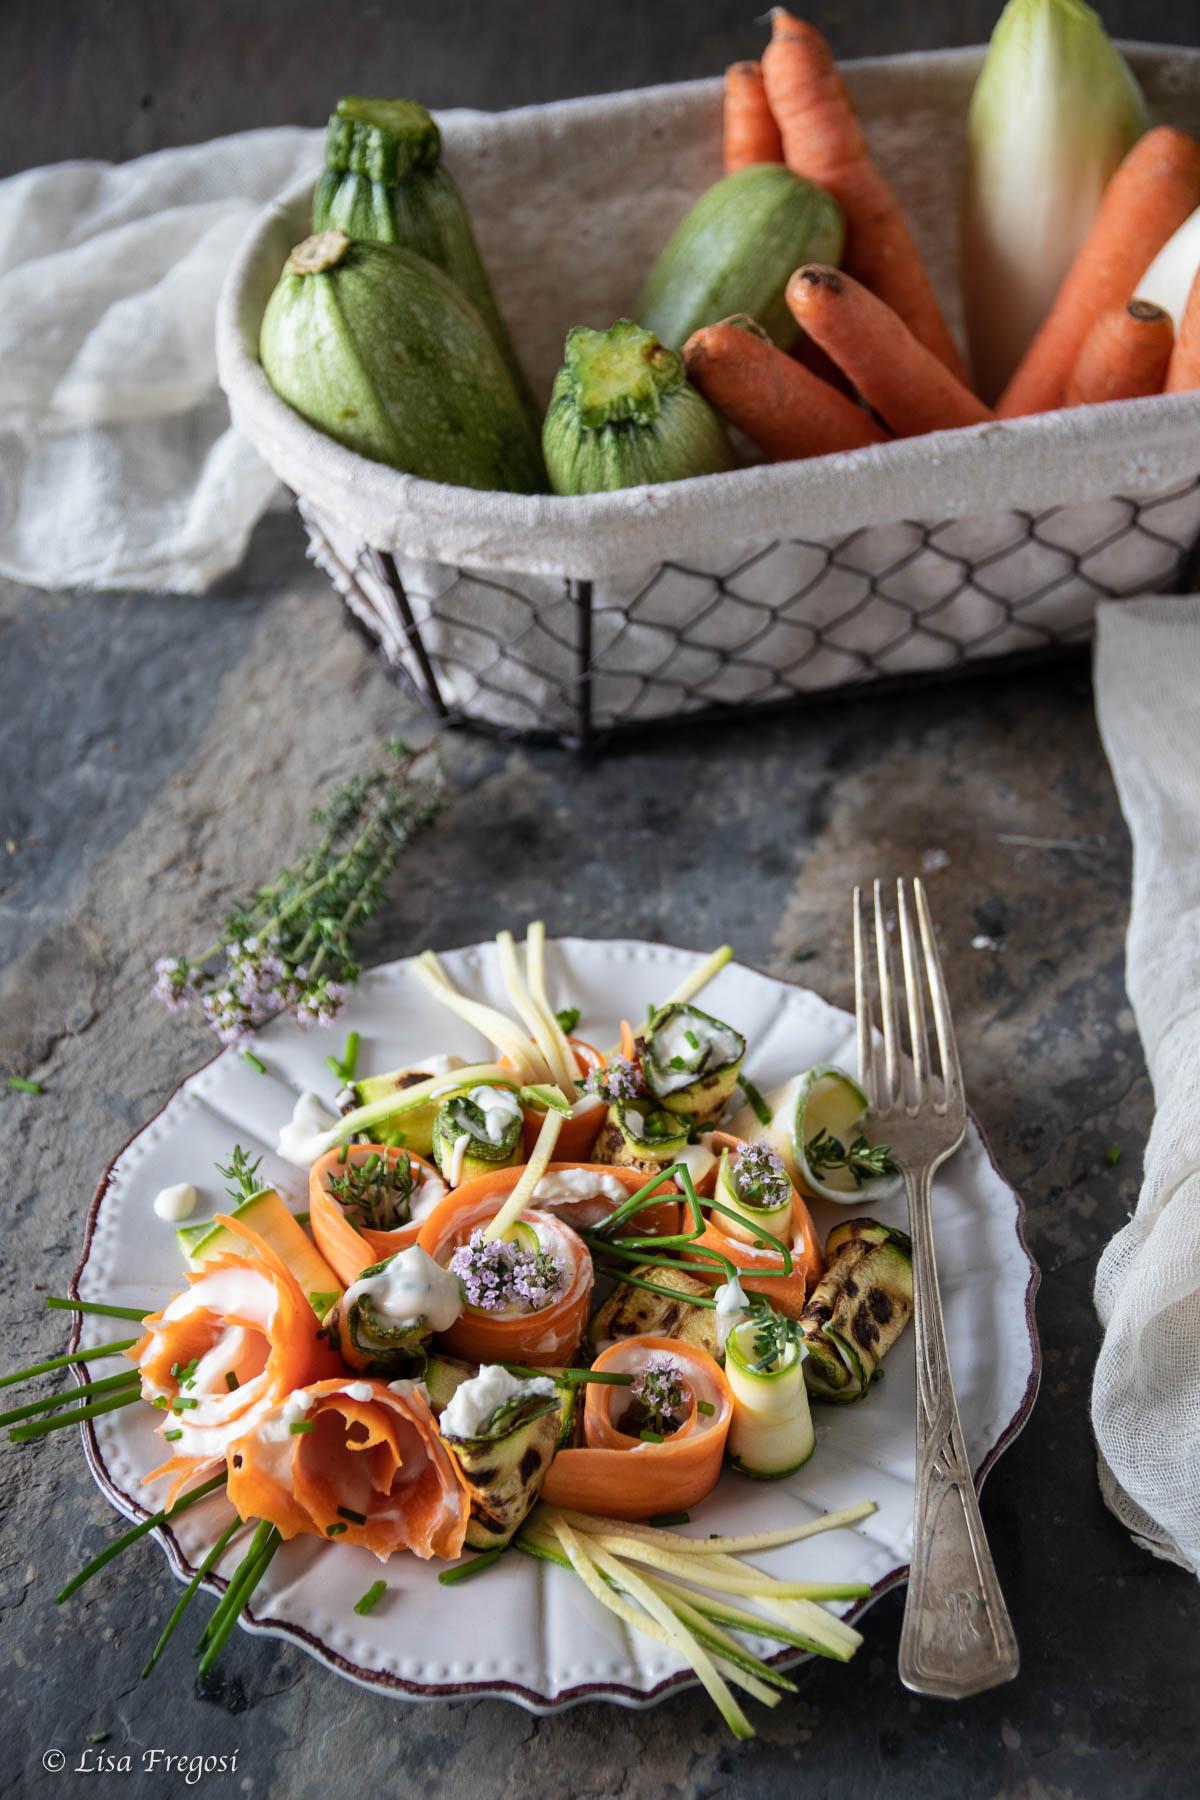 Rotolini di verdure con crema al parmigiano reggiano dop